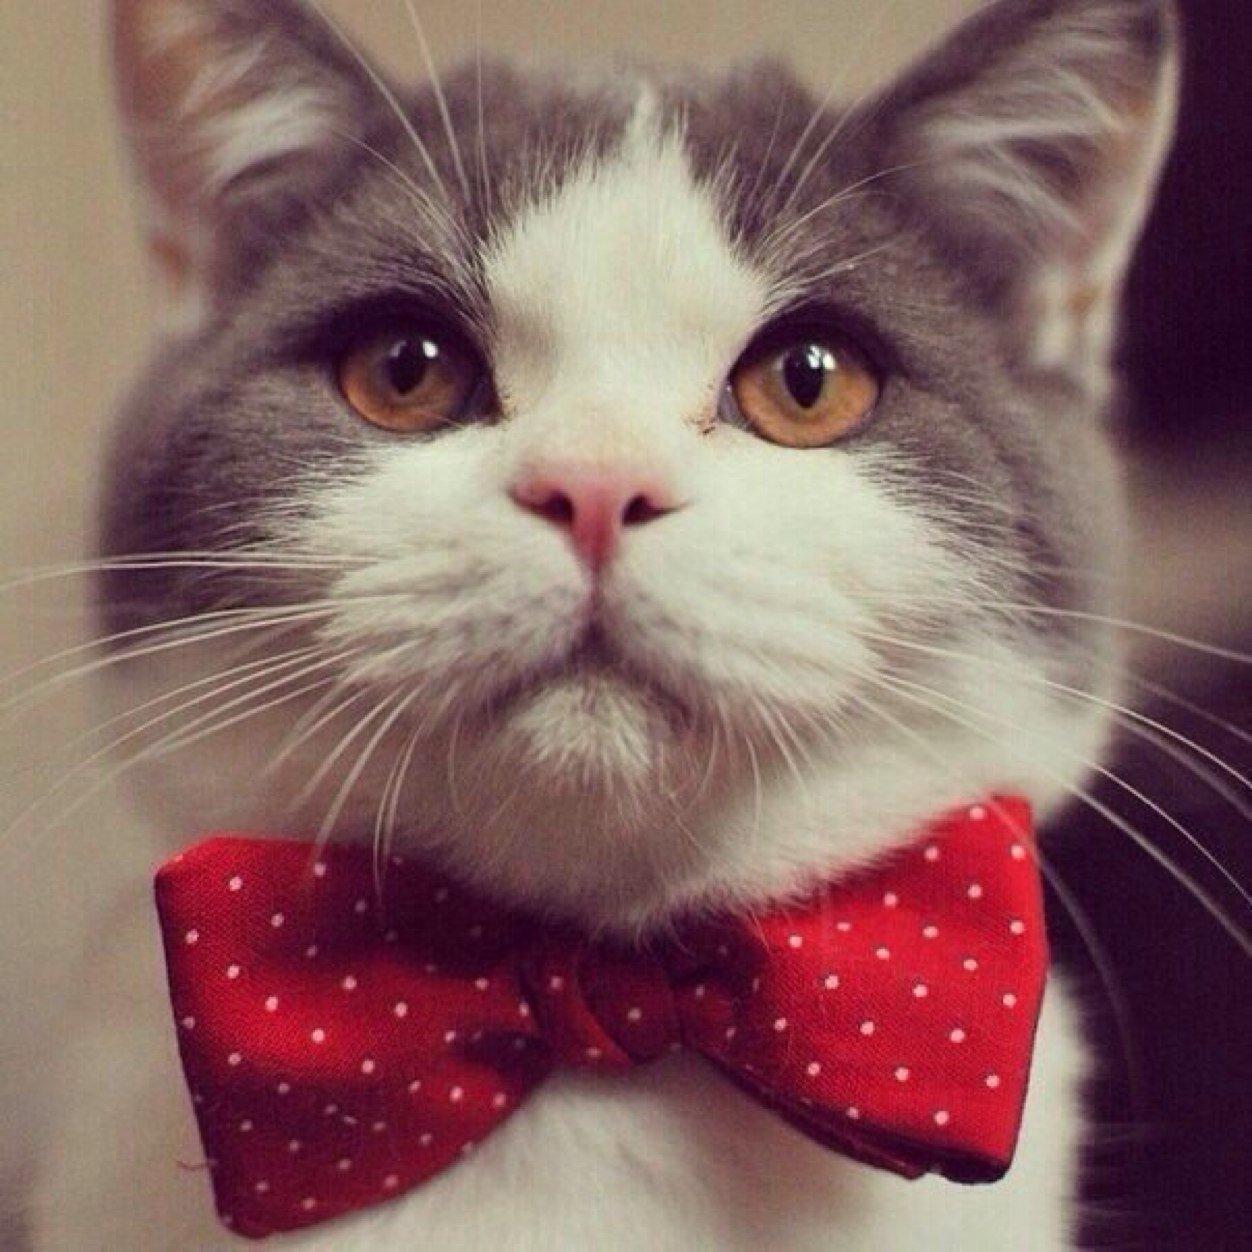 картинка кошка с бантиком на голове